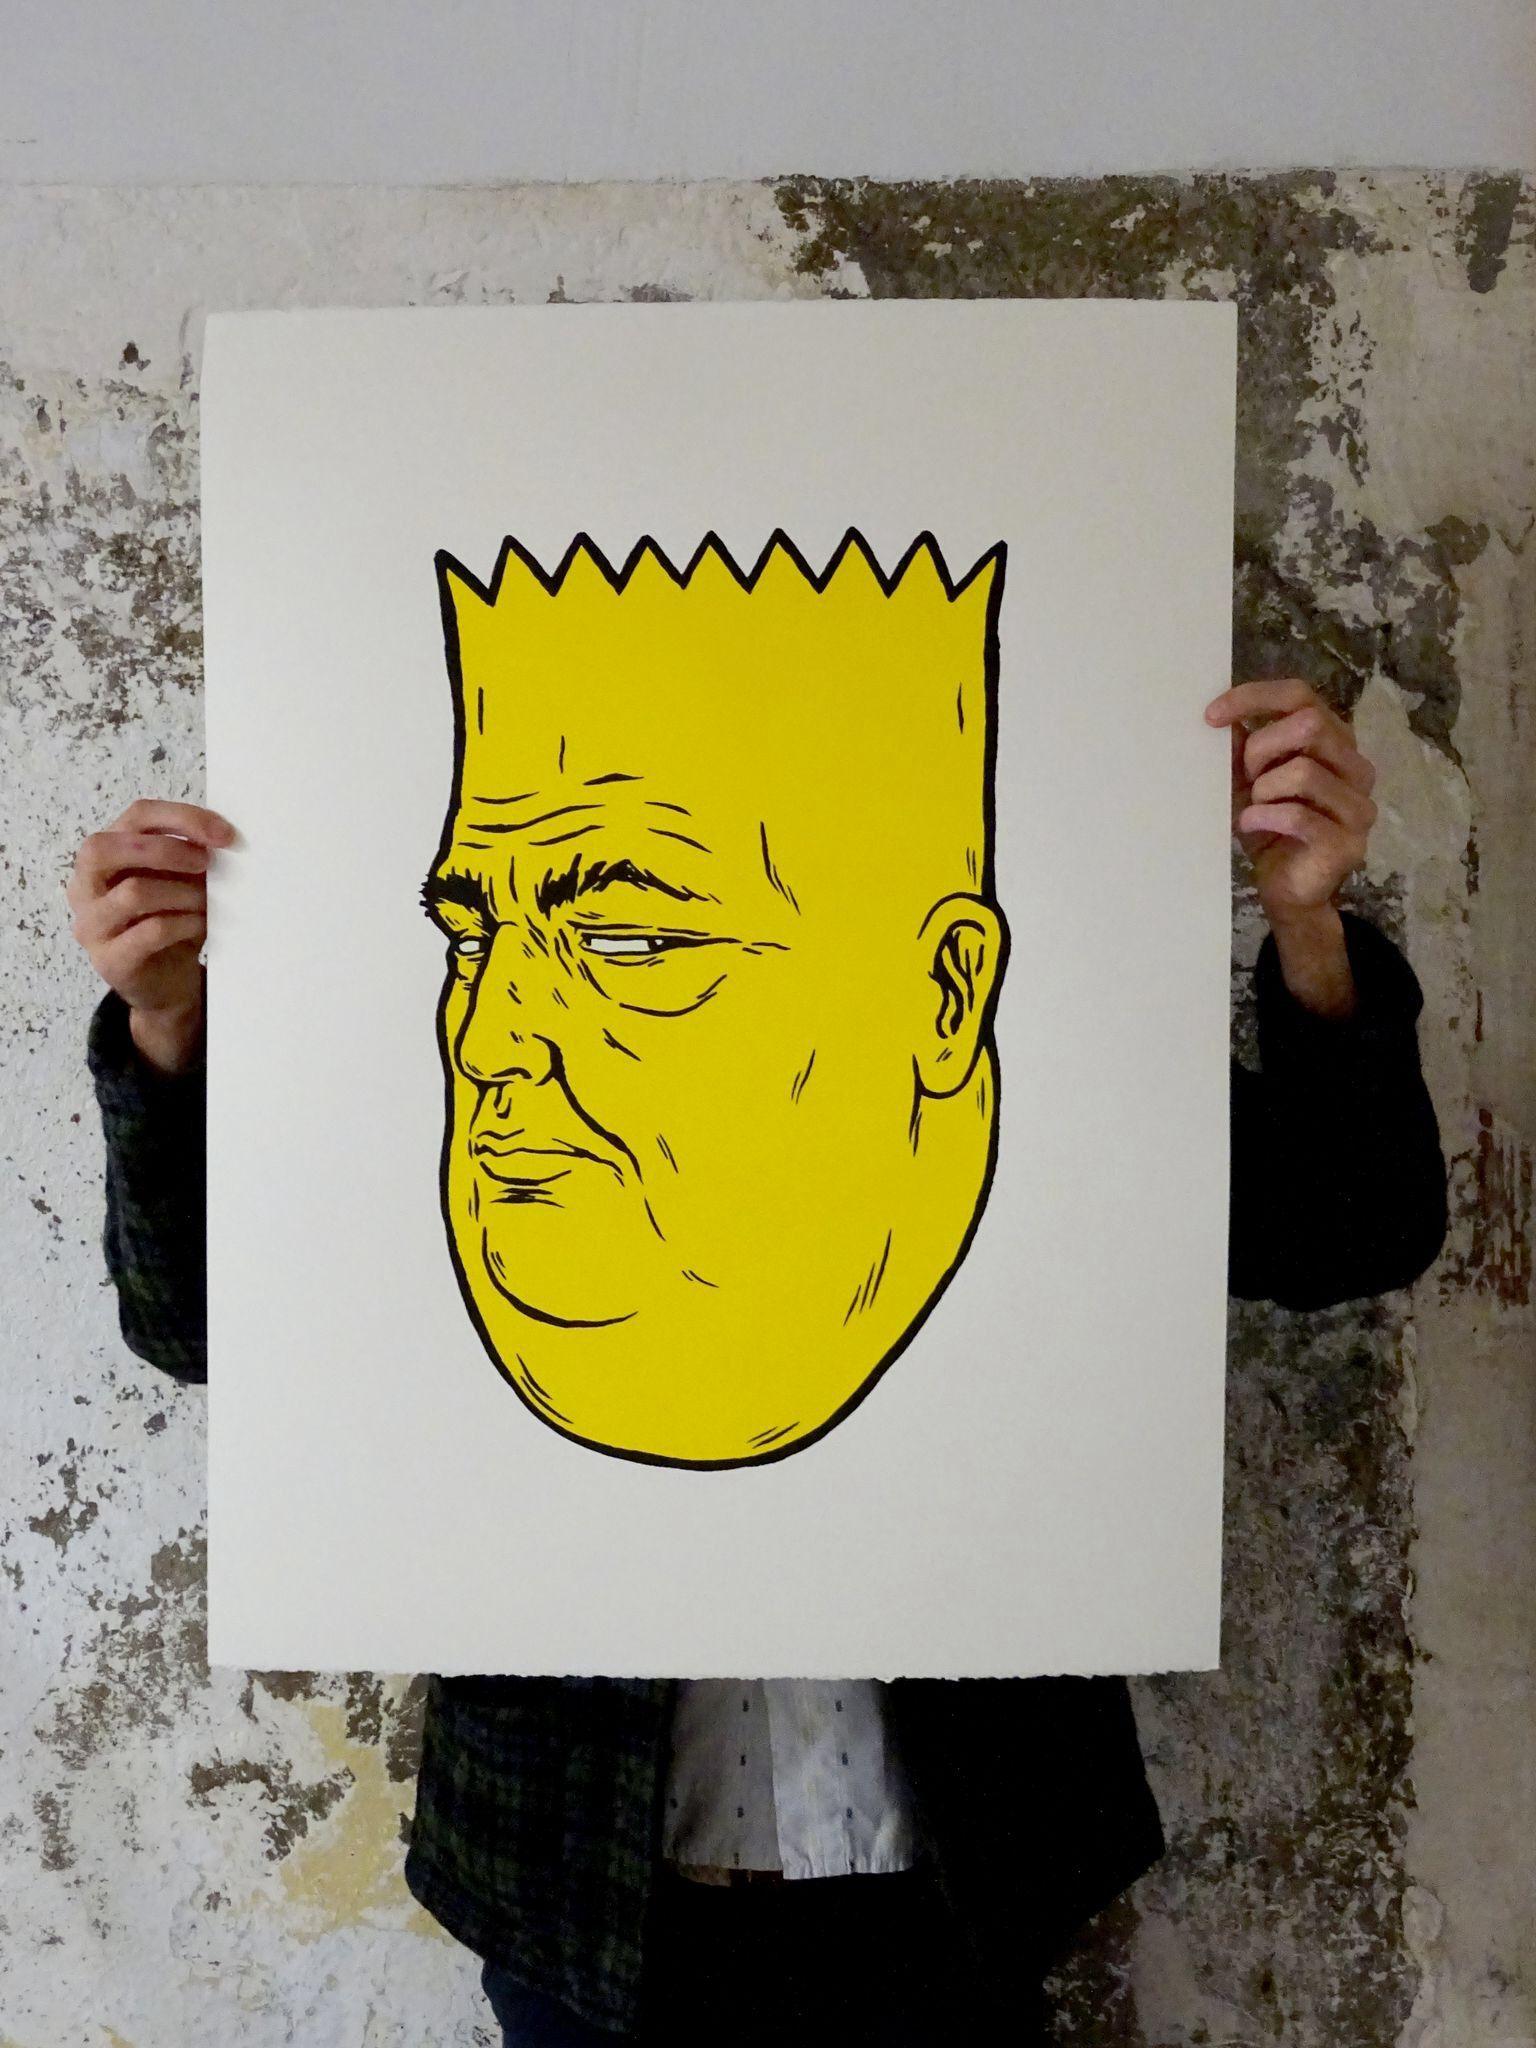 unga broken fingaz fat bart simpson print   art   Pinterest   Bart ...